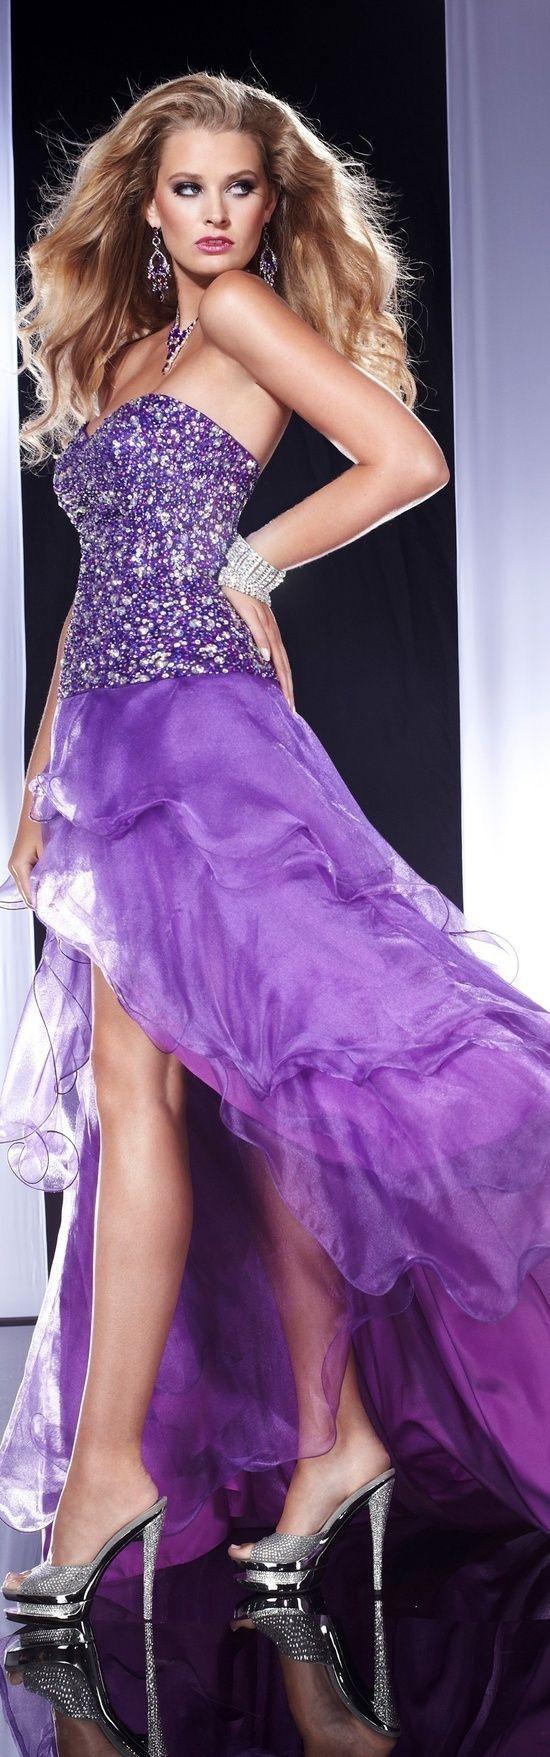 Mejores 138 imágenes de Fashion en Pinterest | Colores púrpura ...